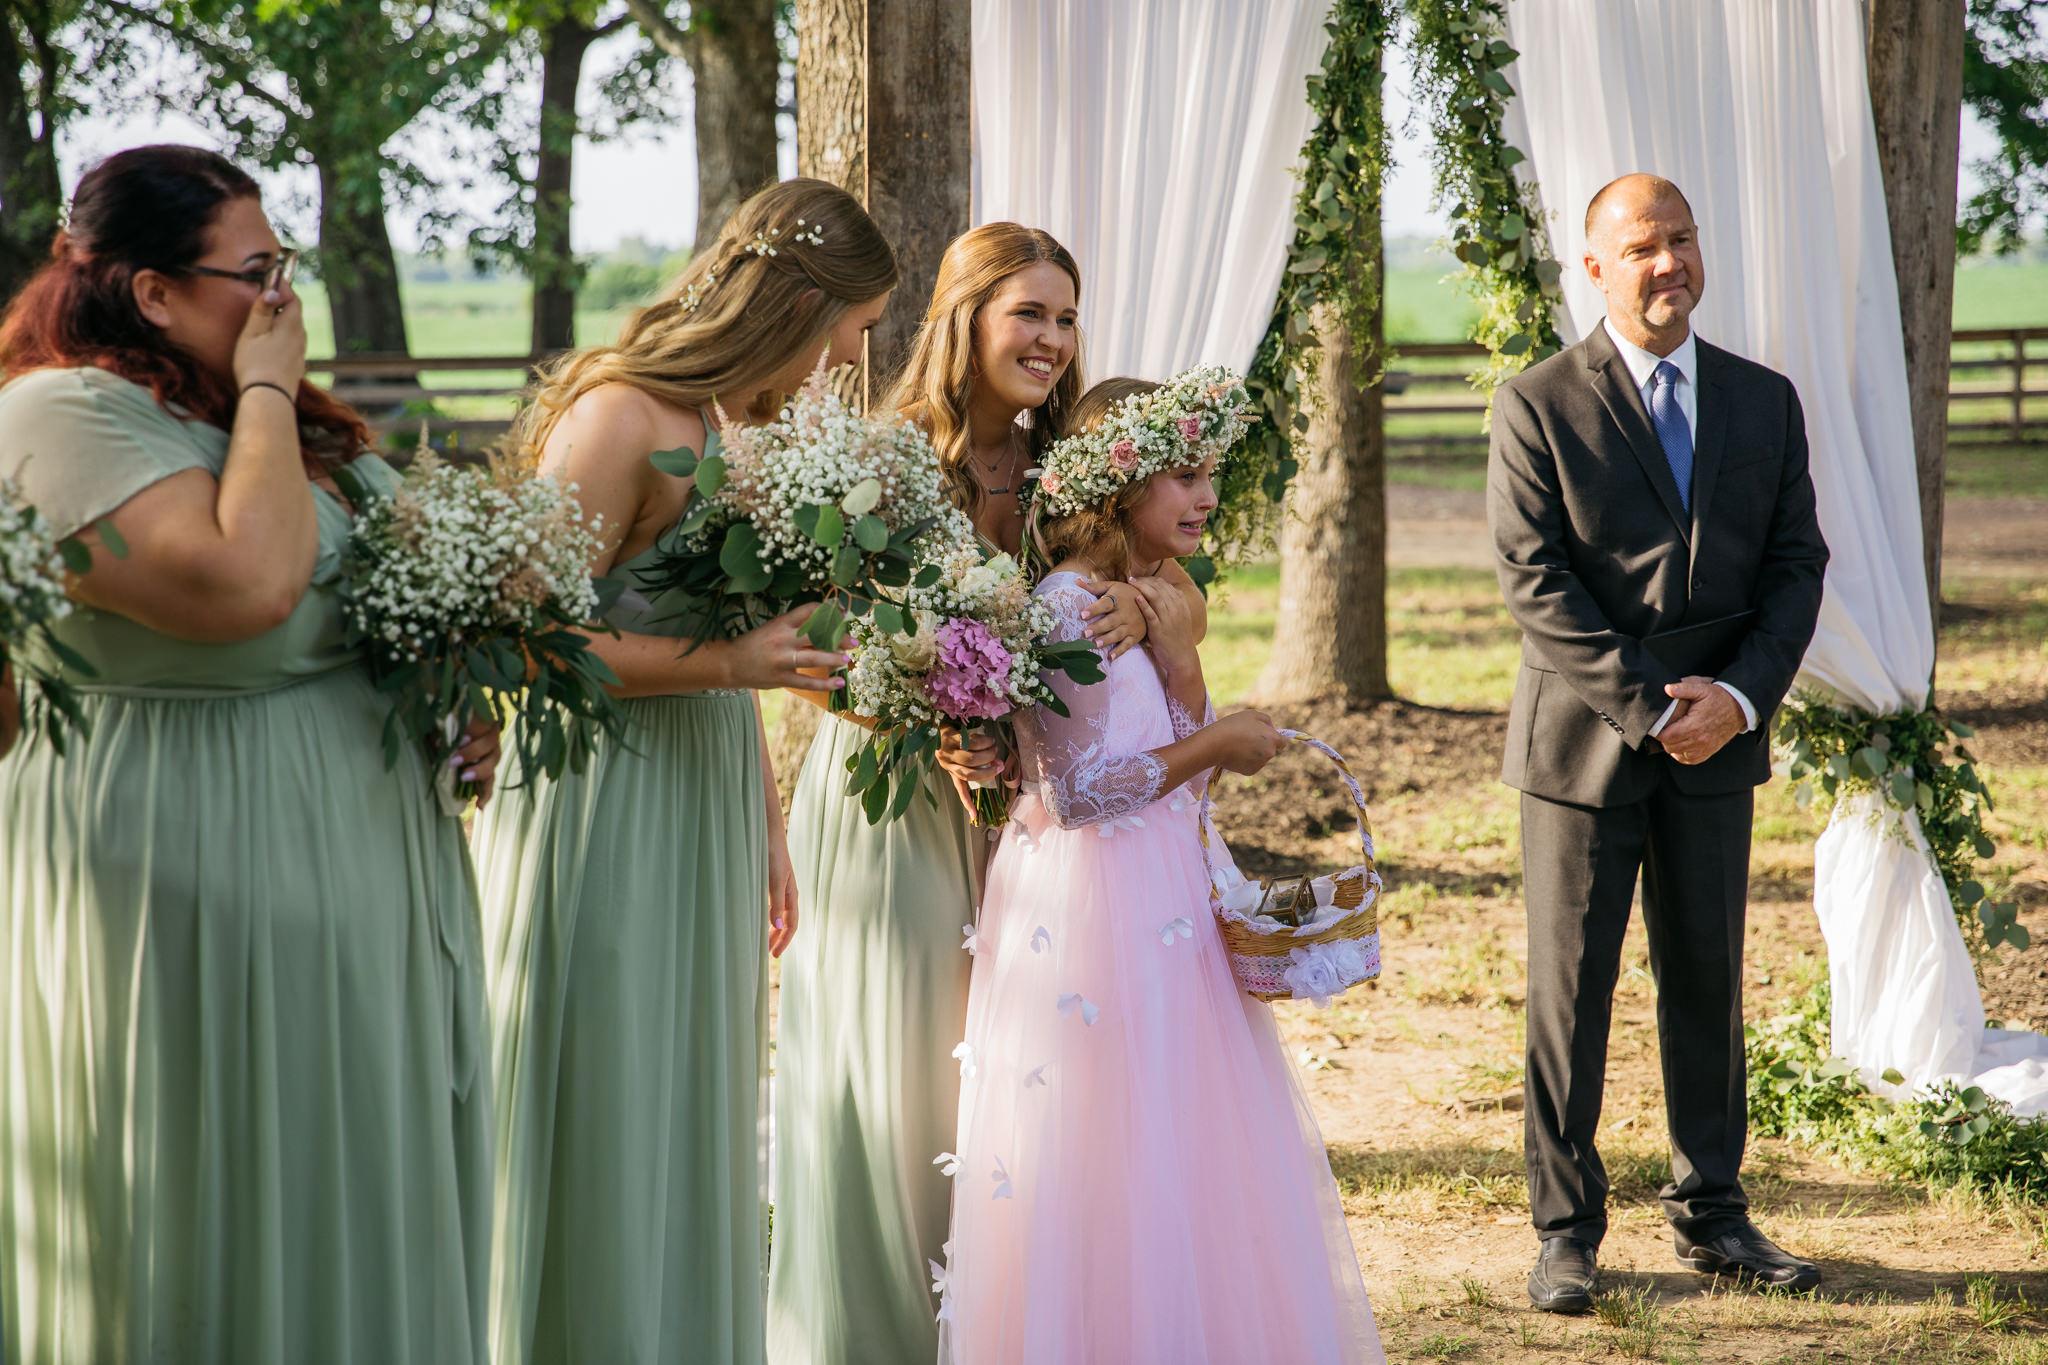 zbackyard-wedding-thewarmtharoundyou-lexy-branson-6.jpg